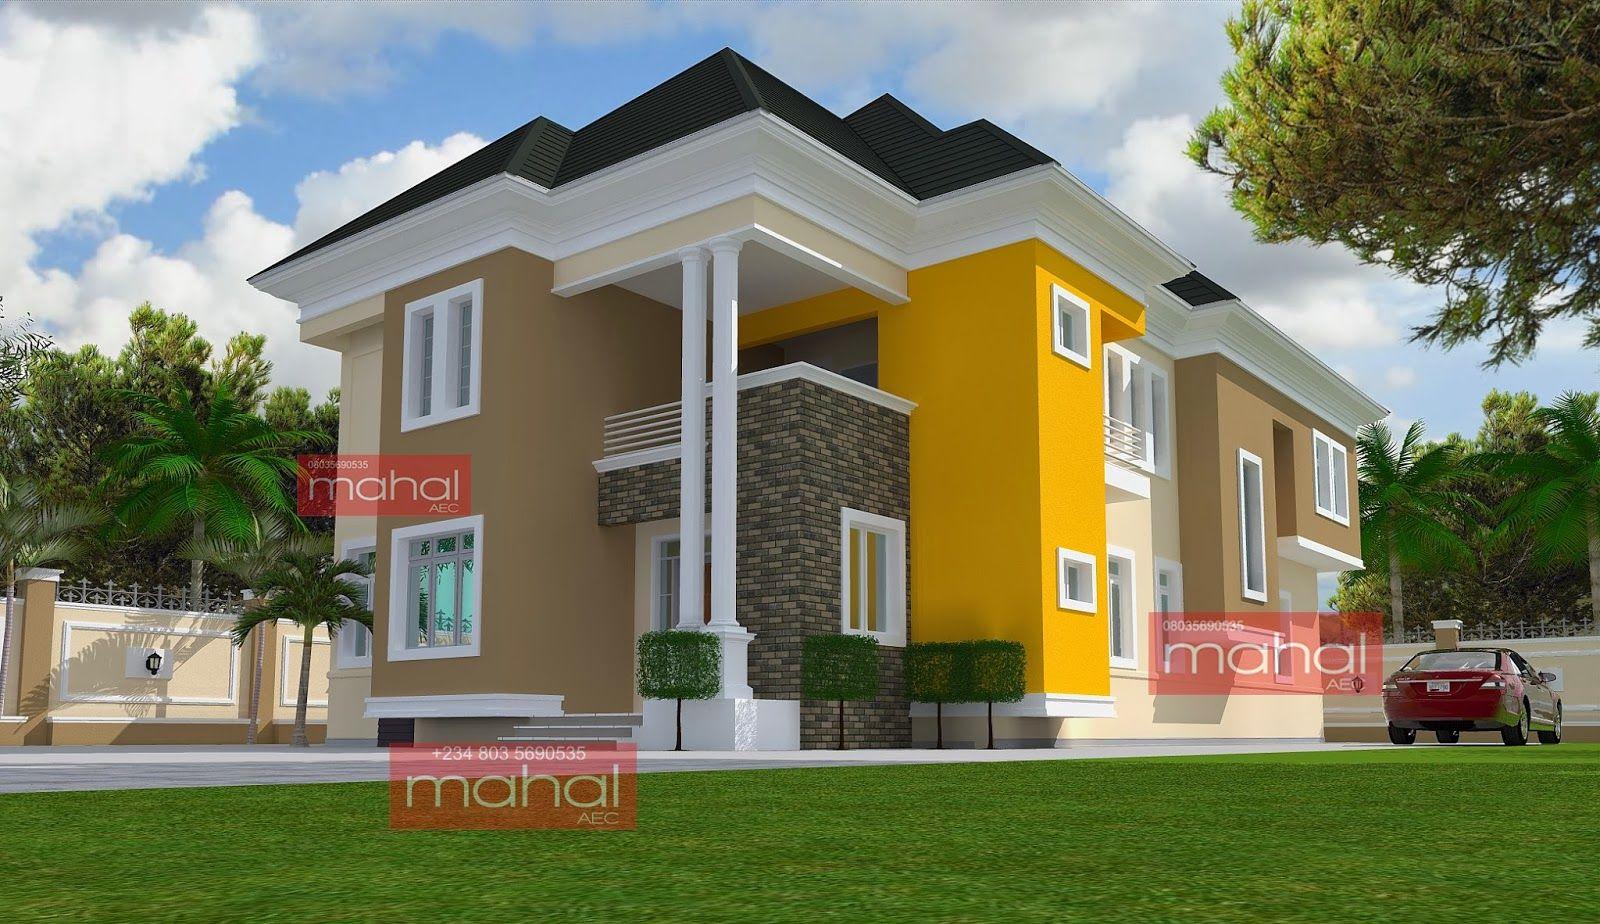 Contemporary Nigerian Residential Architecture 4 Bedroom Duplex Mercy T House Series Duplex House Plans Duplex Design Duplex House Design